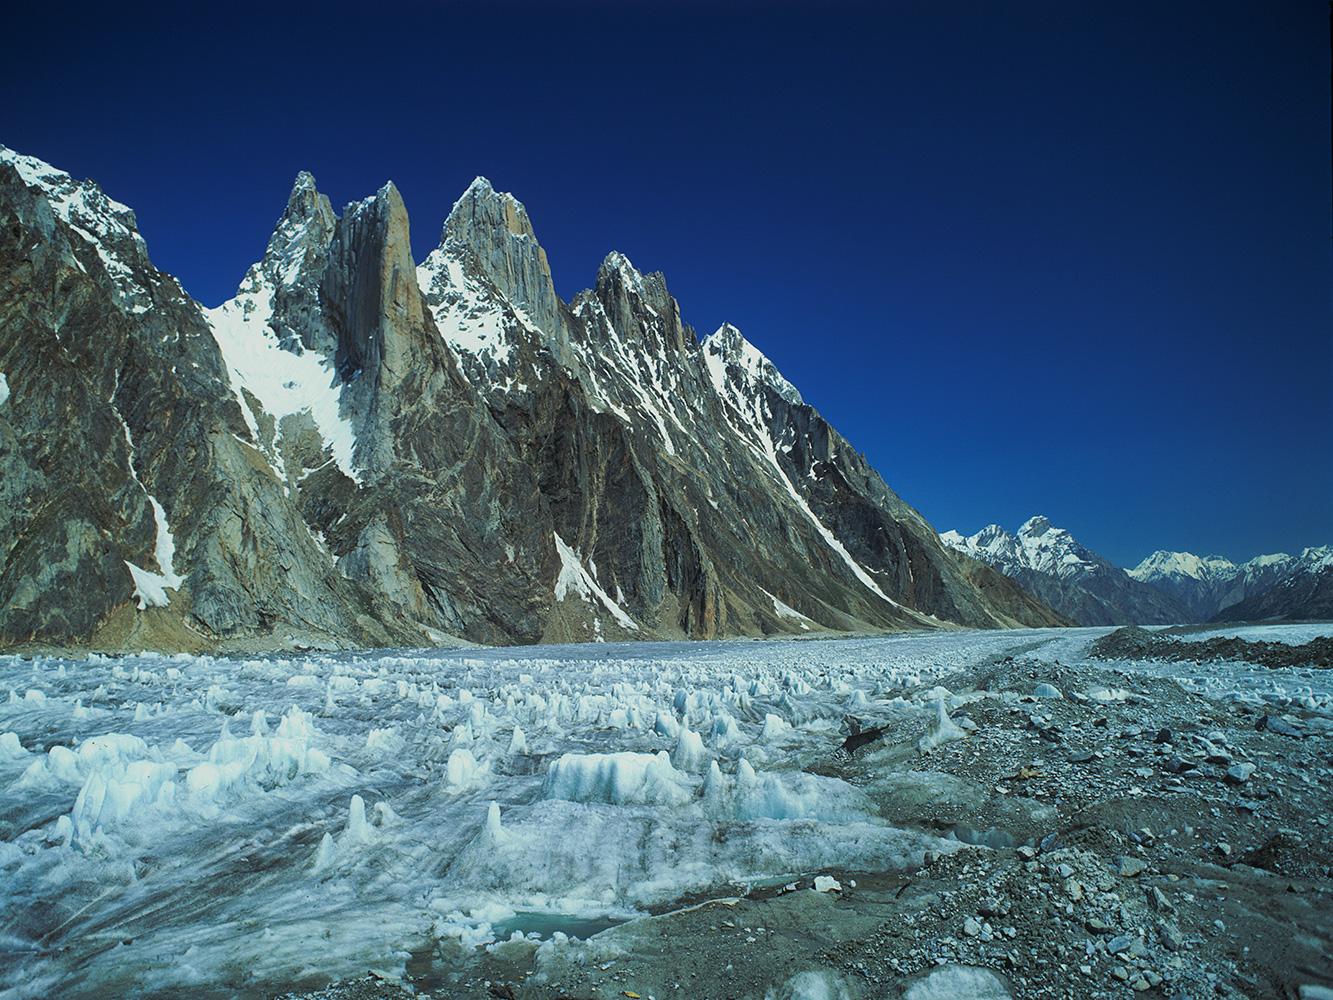 Central Karakoram, Pakistan